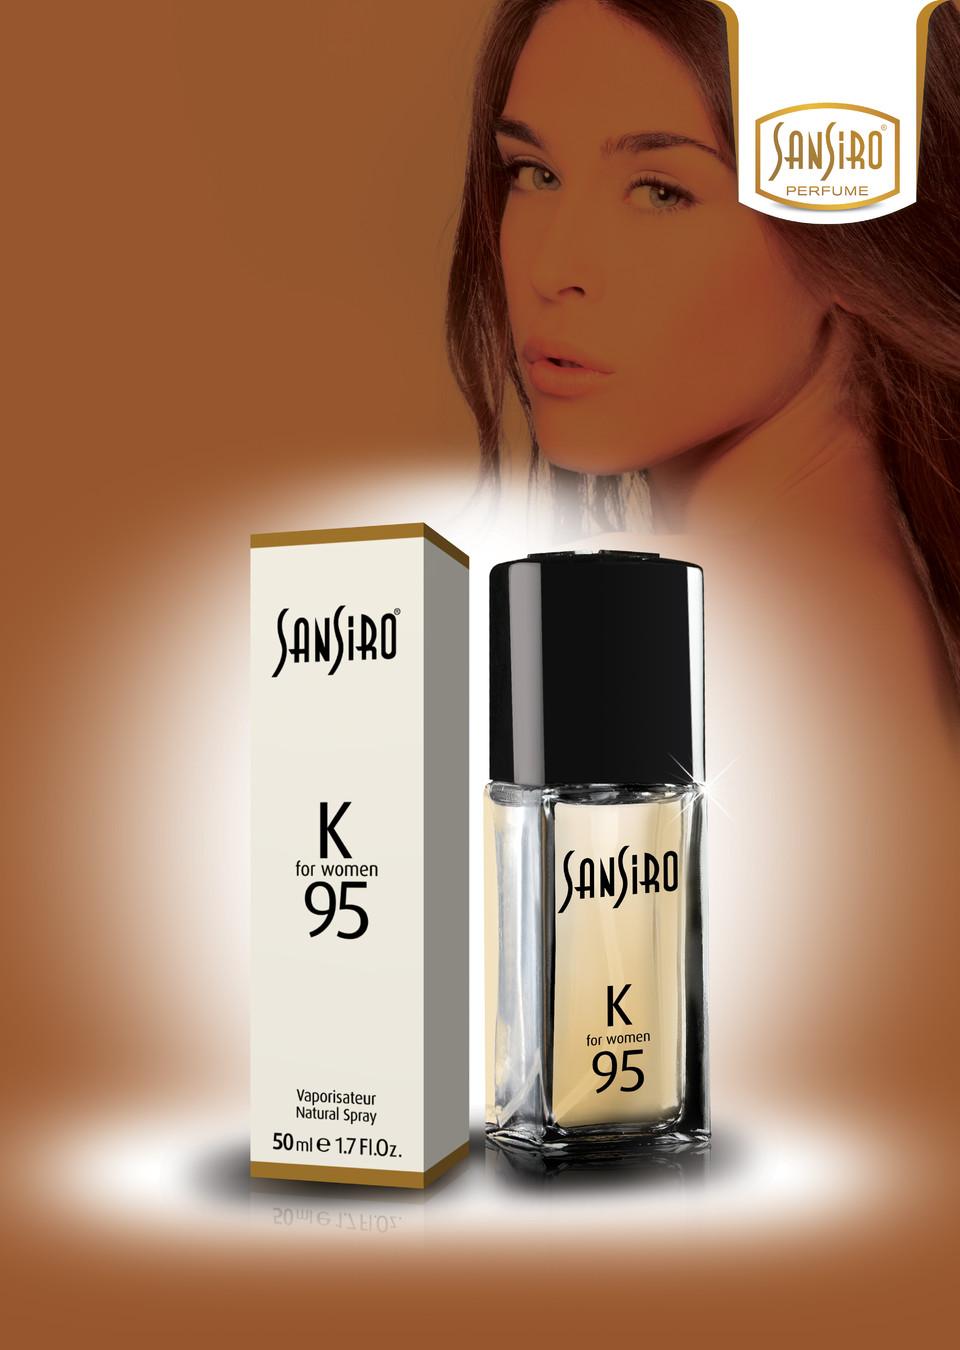 Sansiro Perfume - For Women -Blanda Woman (K95)